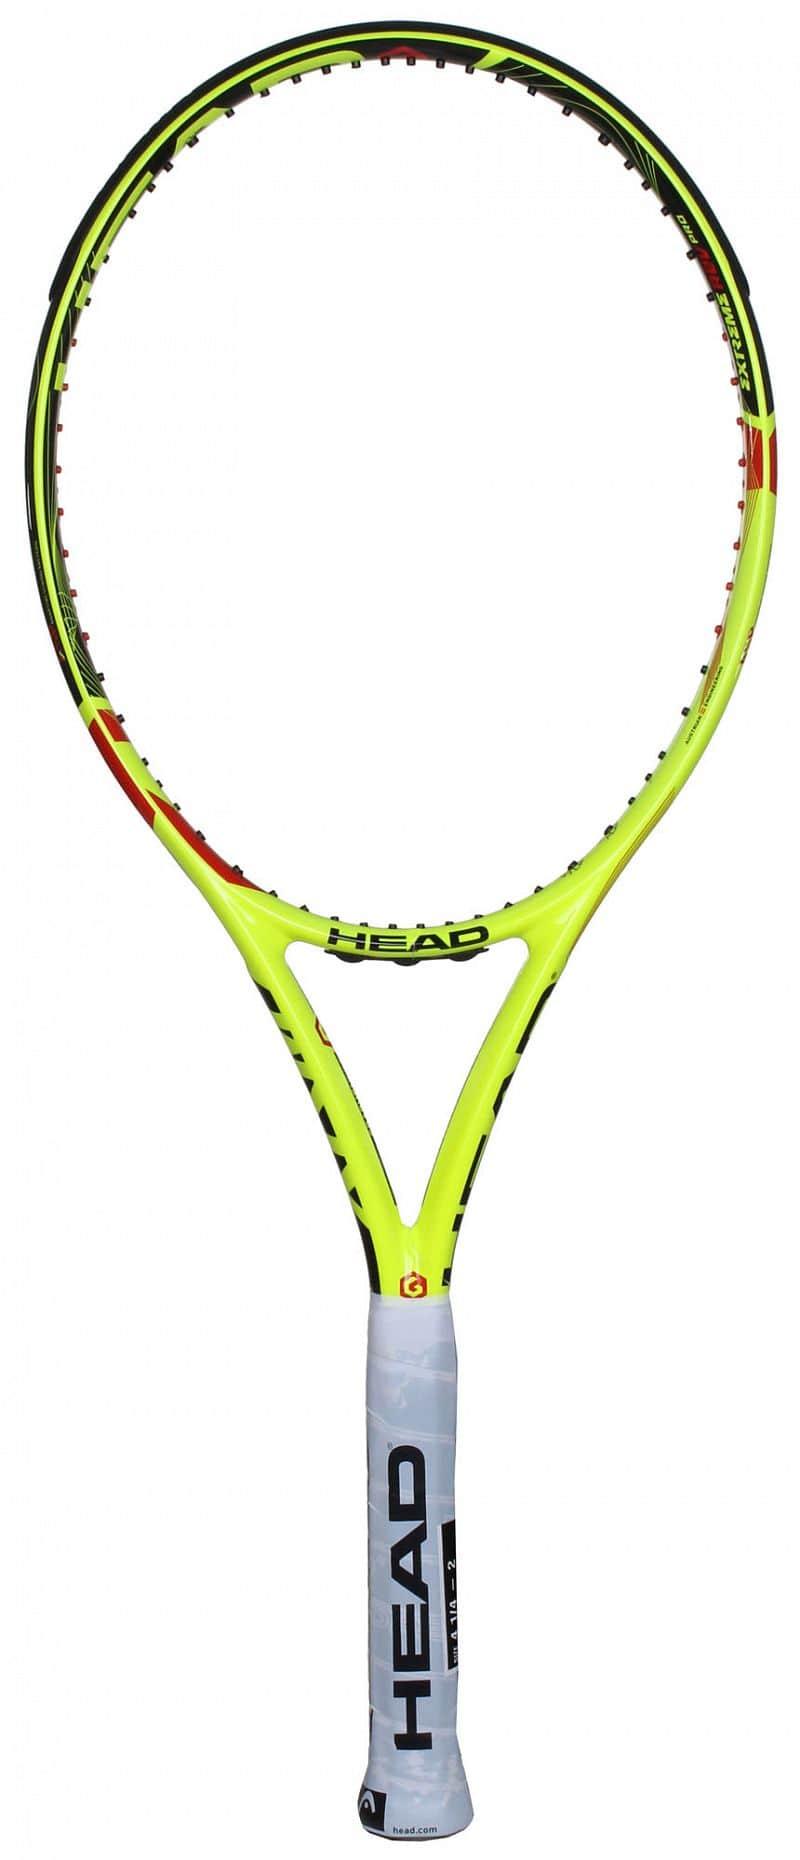 Graphene XT Extreme REV PRO 2016 tenisová raketa grip: G1